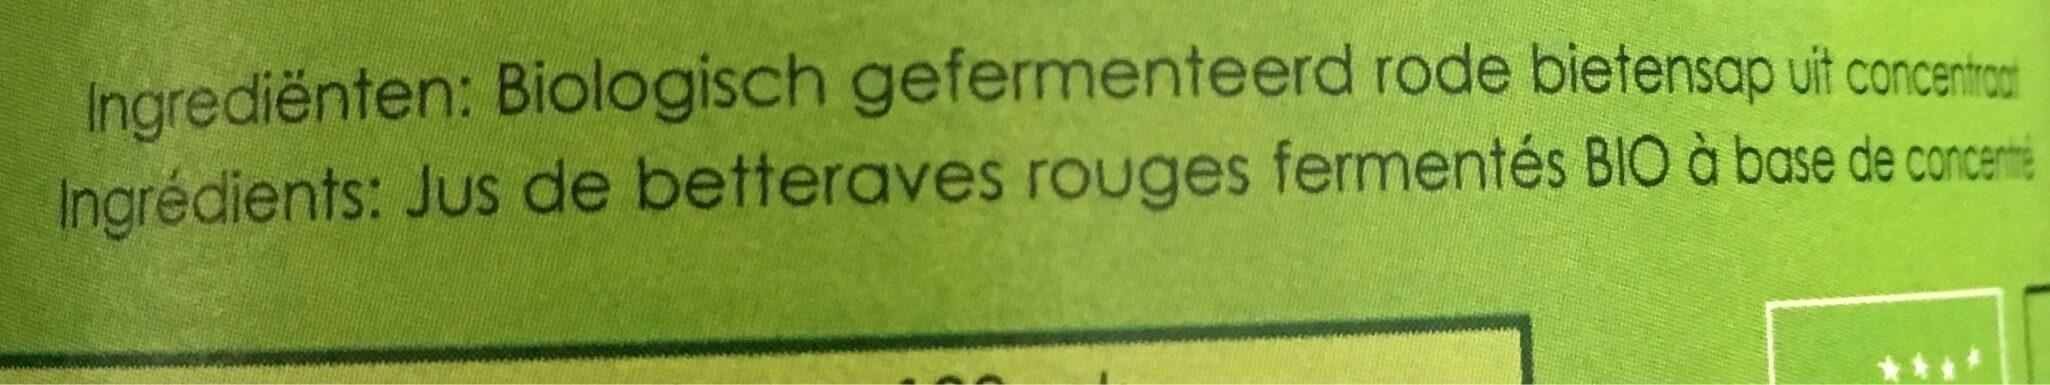 Jus de betteraves rouges - Ingrediënten - fr